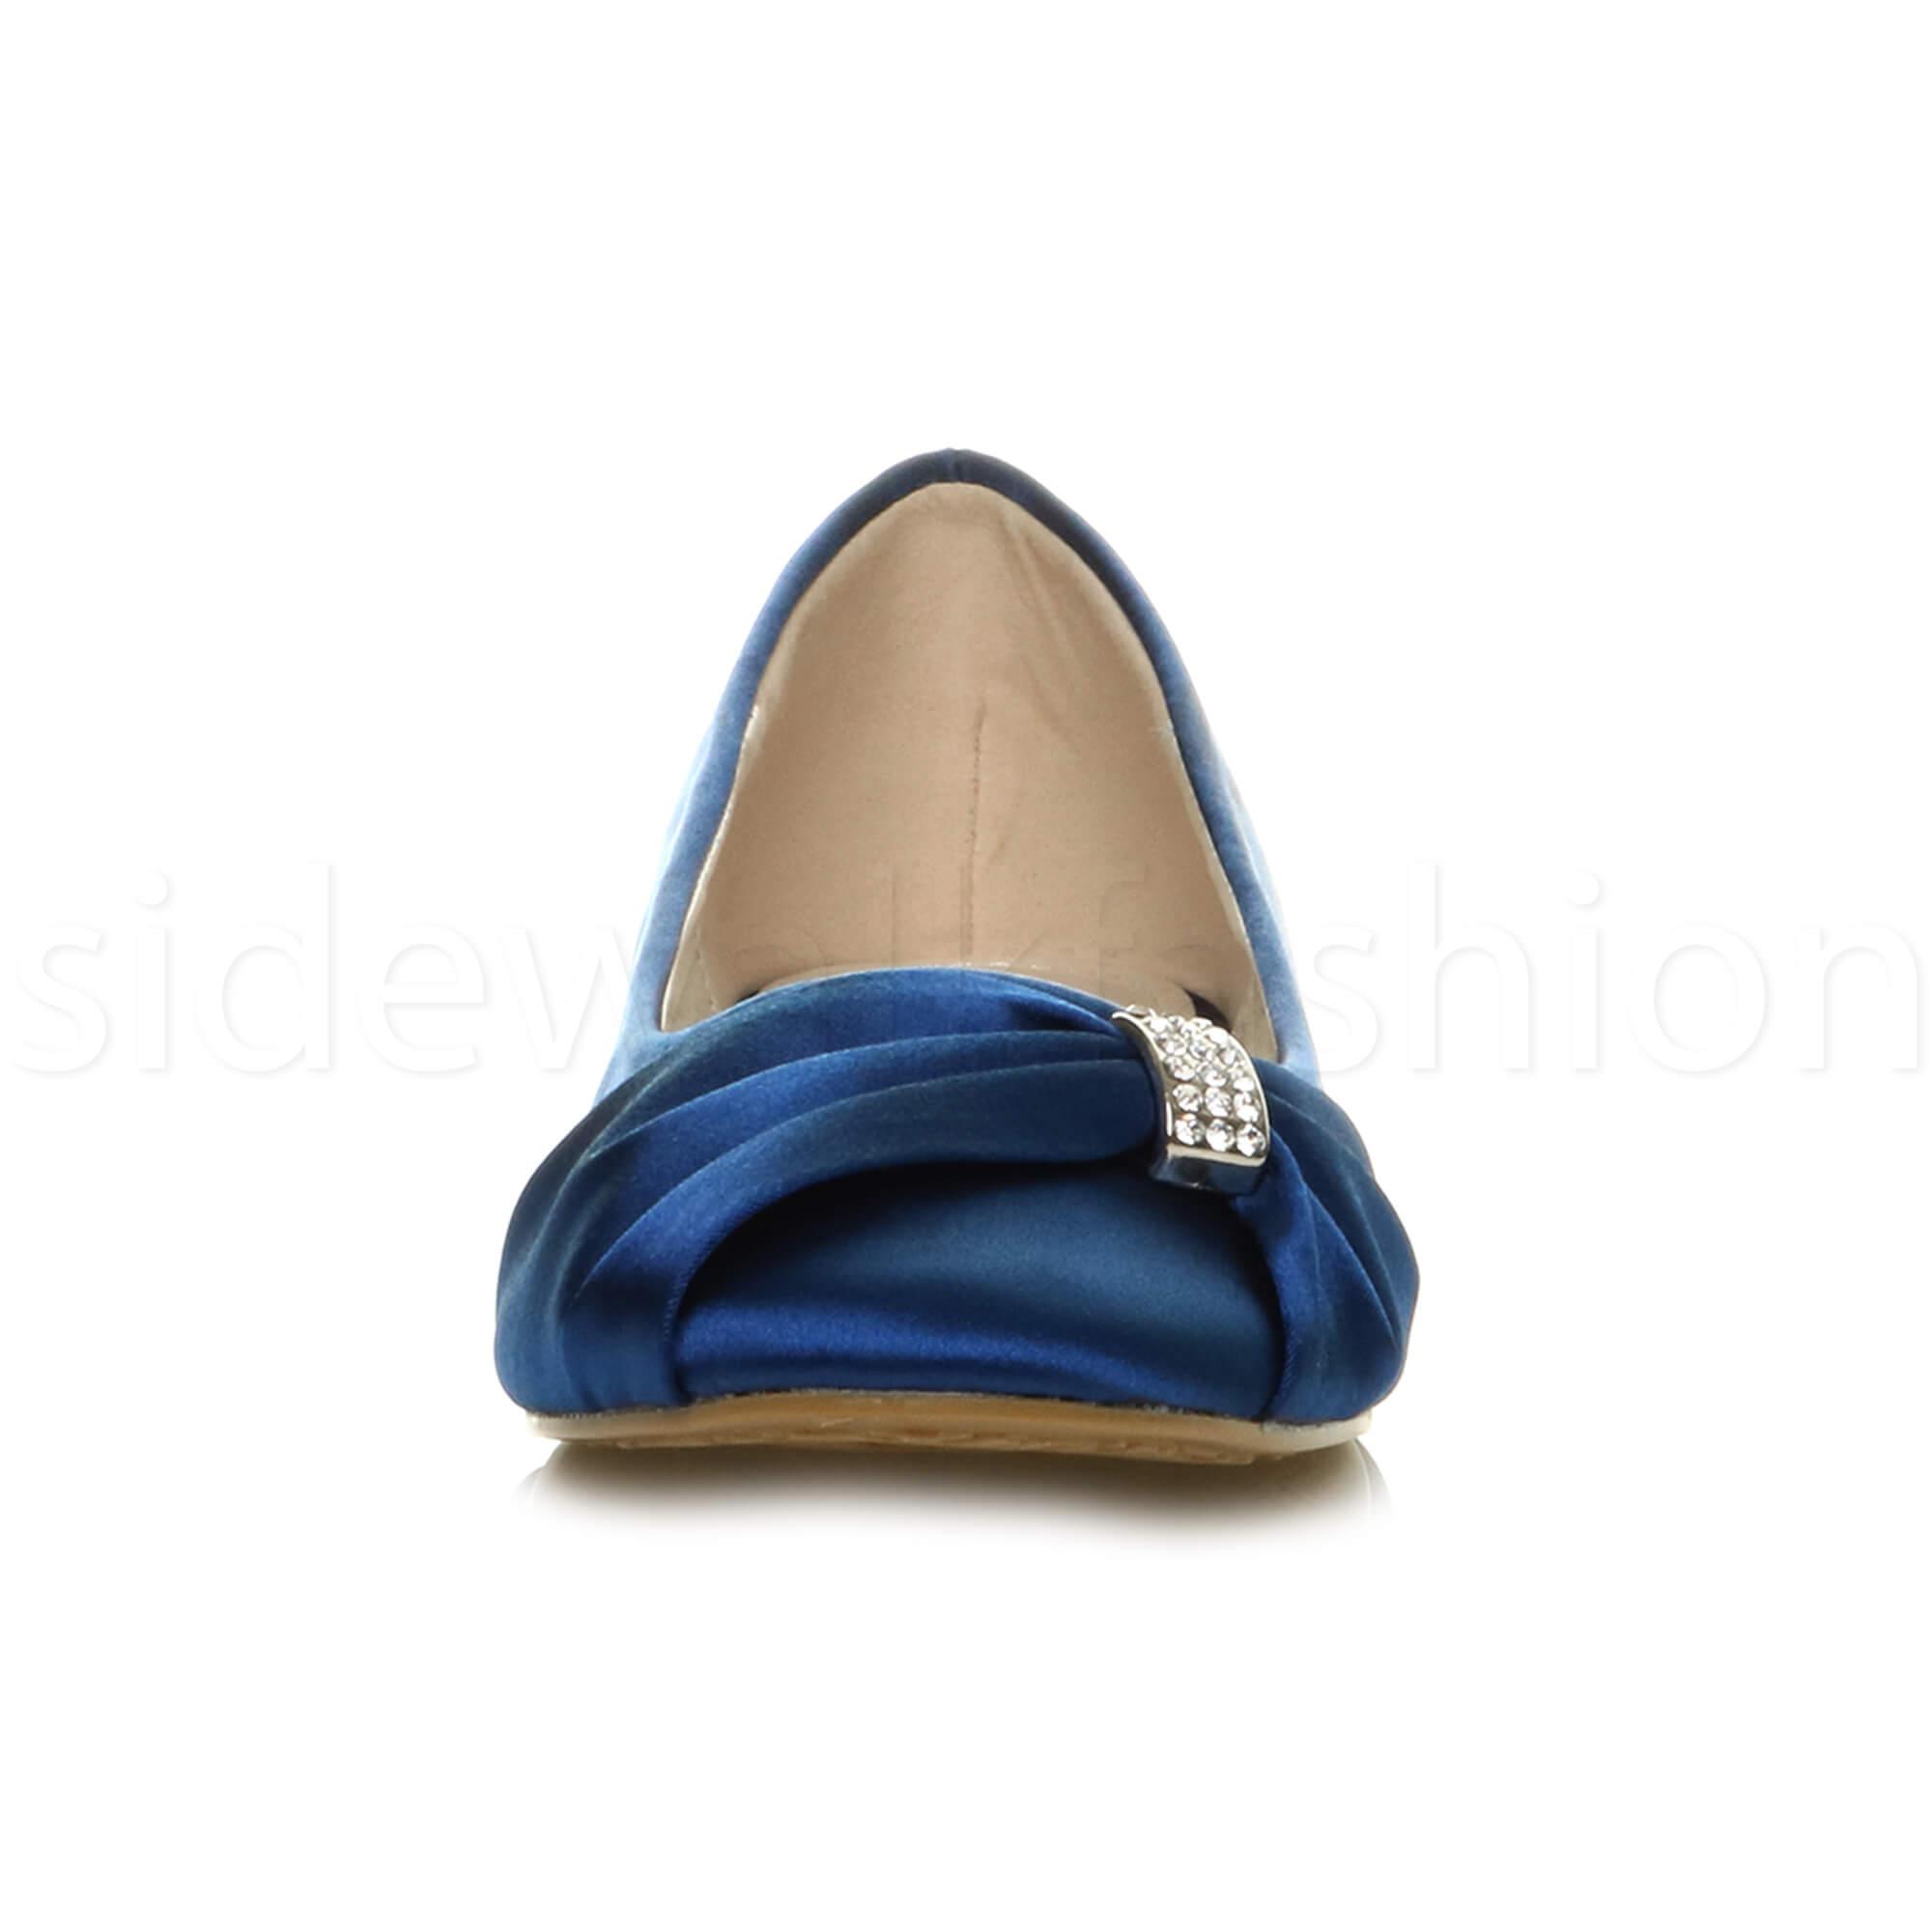 Womens-ladies-flat-wedding-bridesmaid-ruched-diamante-bridal-shoes-pumps-size thumbnail 23